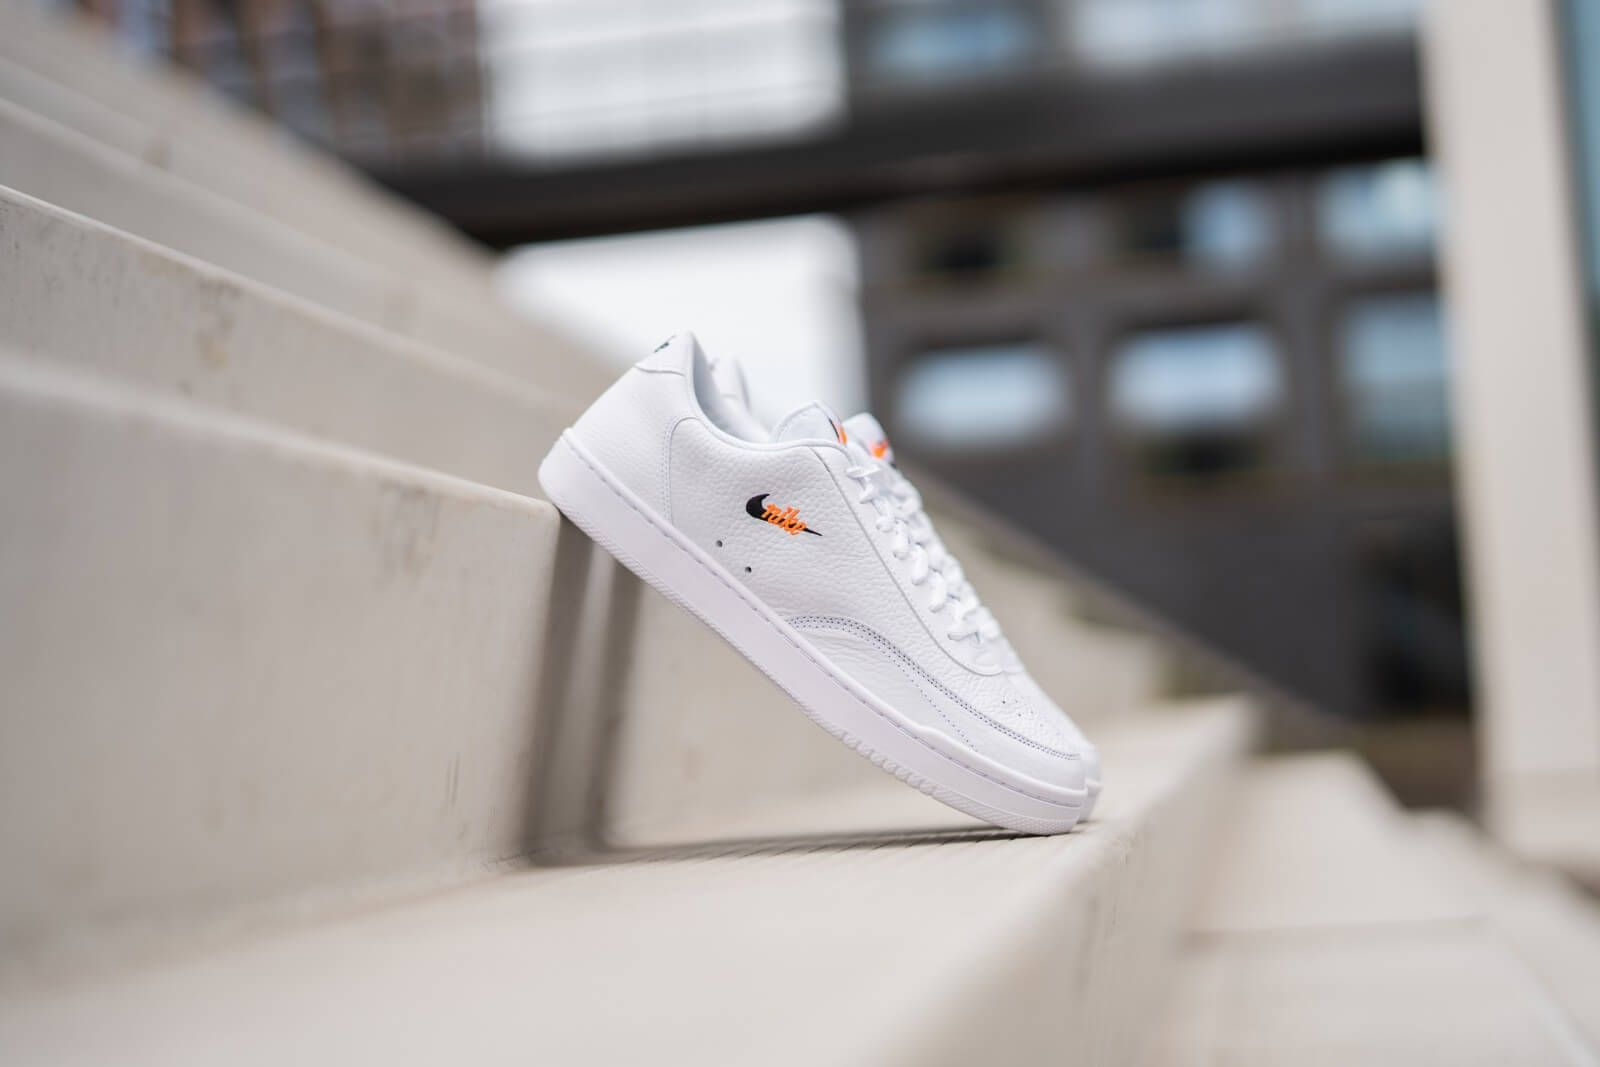 Nike Court Vintage Premium White Black Orange Ct1726 100 In 2020 Vintage Sneaker Nike